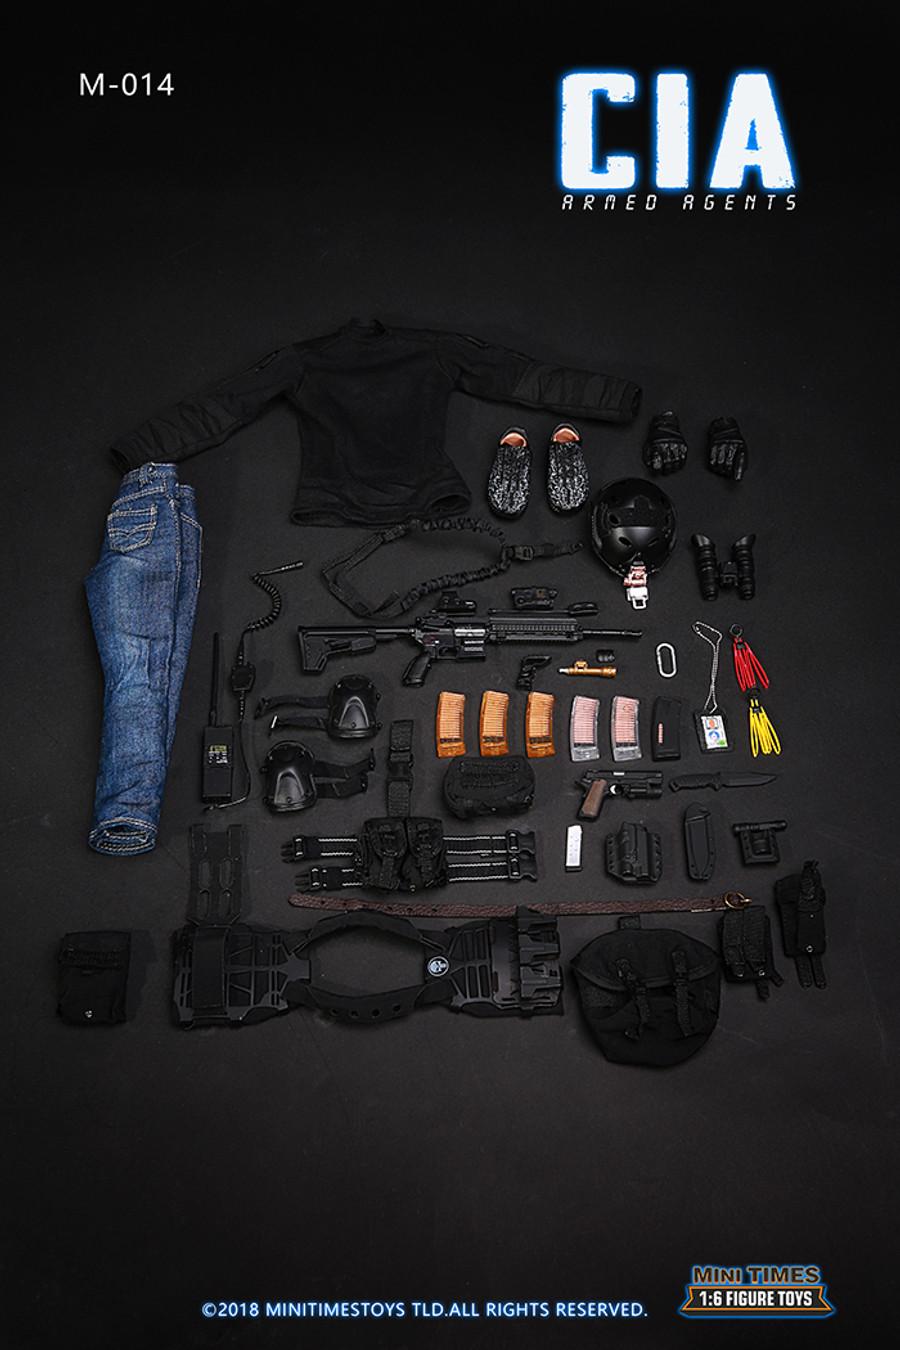 Mini Times - CIA Armed Agent Clothing Set